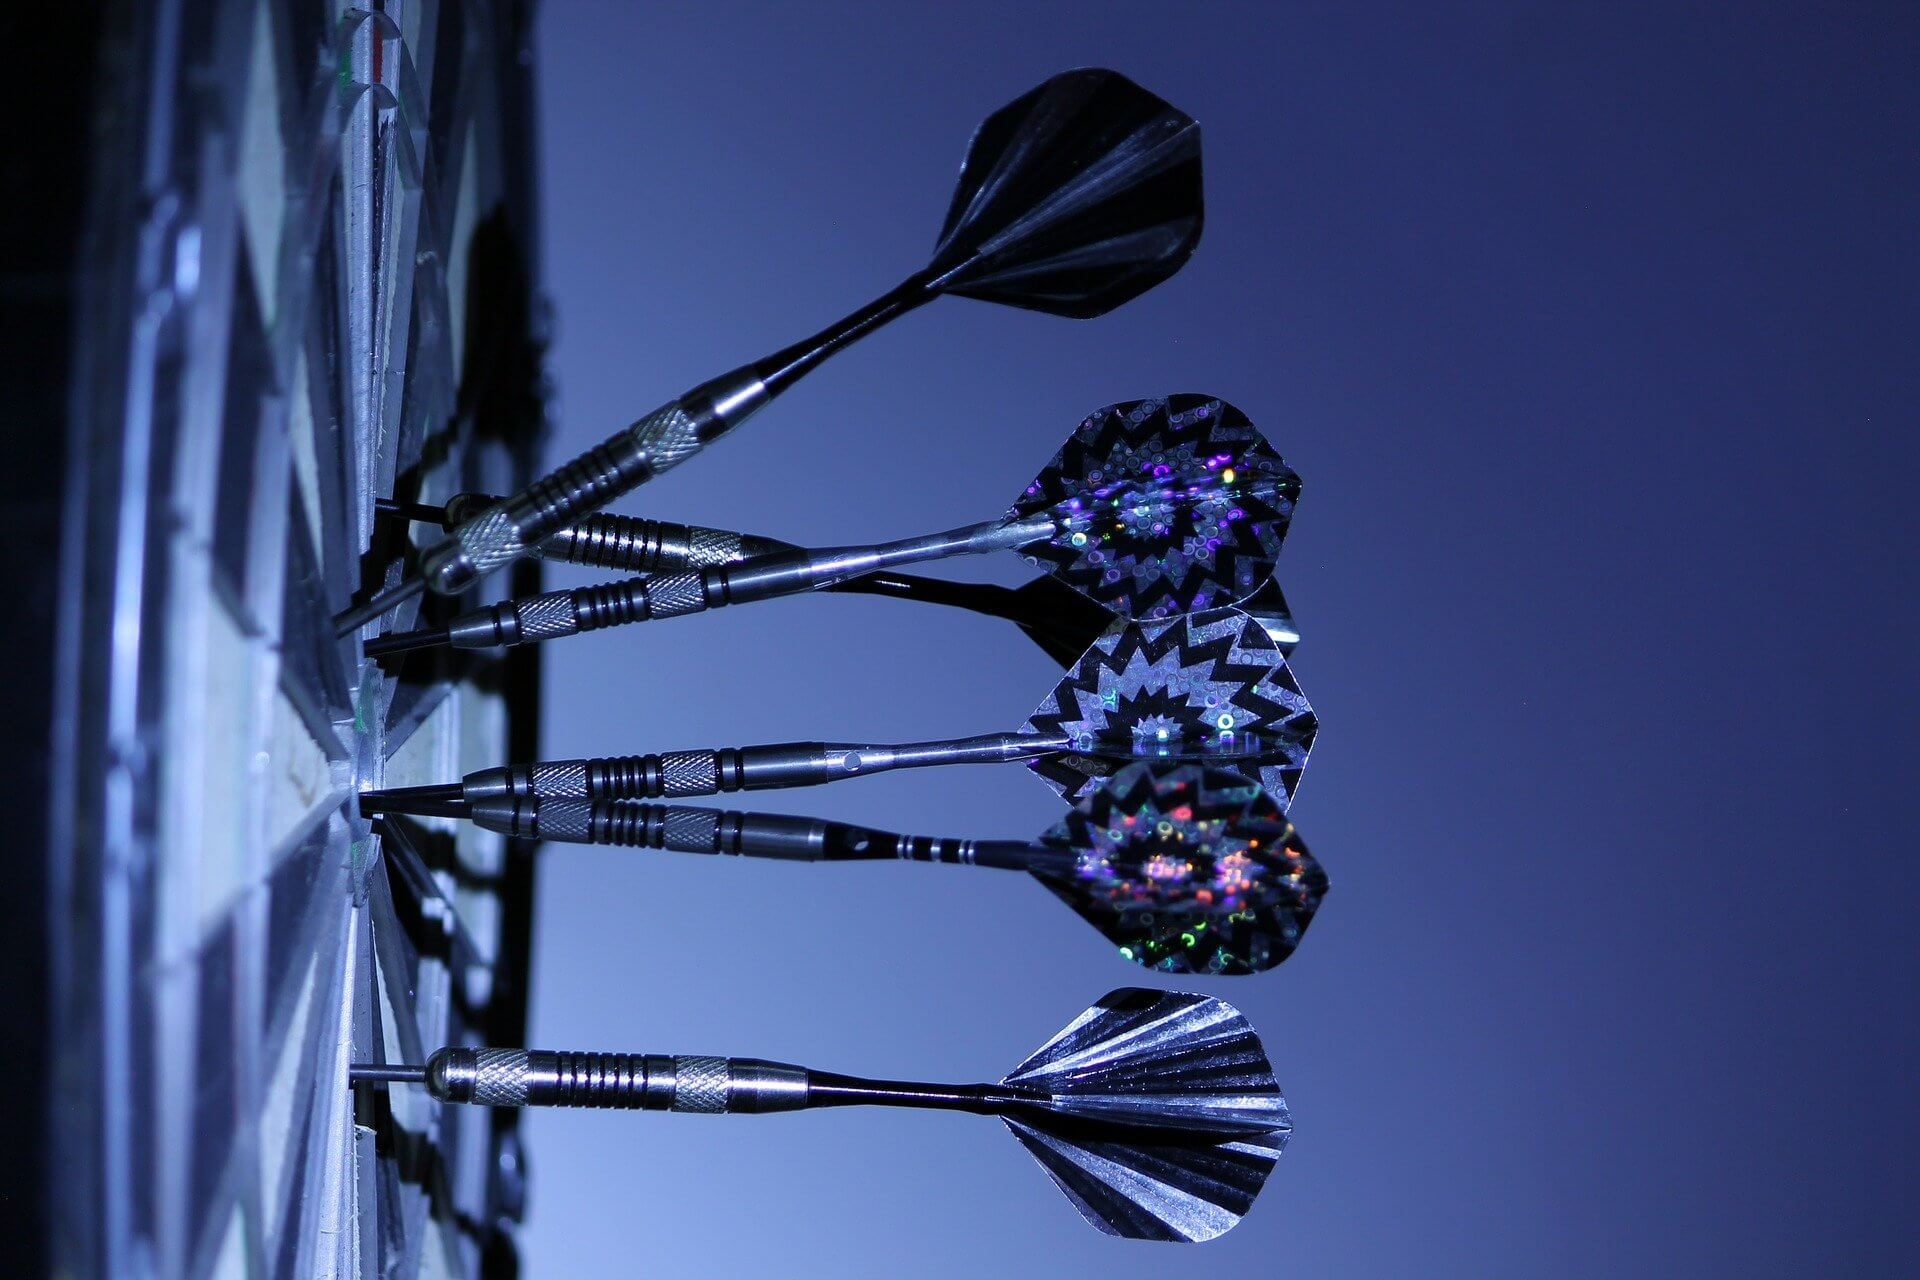 Hoshin Kanri v 4DX v MBO: Complementary Strategy Execution tools?